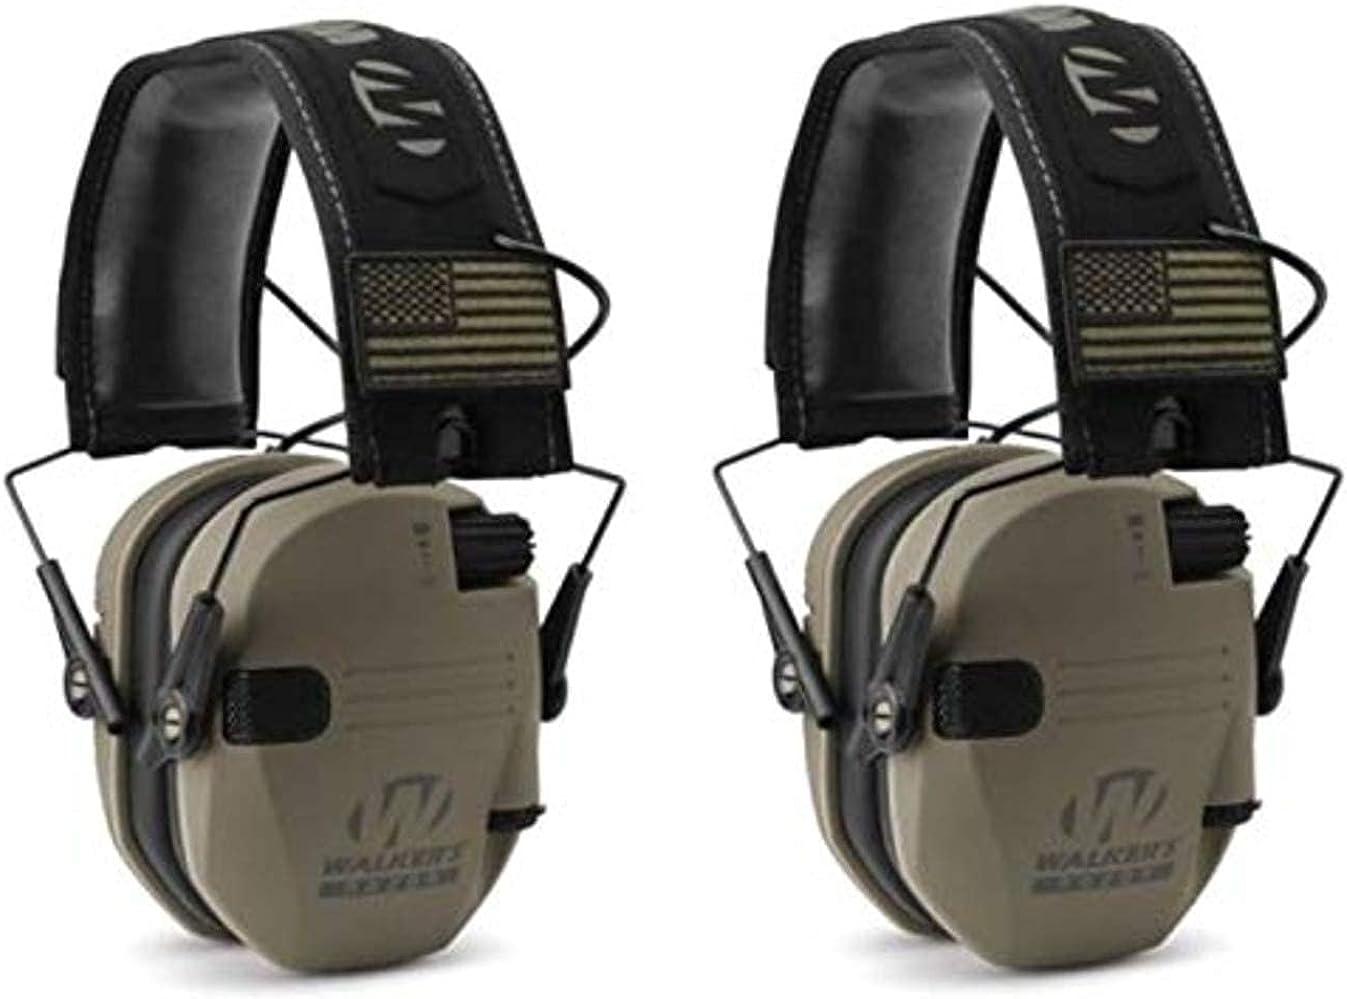 Walkers GWPRSEMPAT Razor Patriot National uniform free shipping Electronic D dB 23 Earmuff Japan Maker New Flat